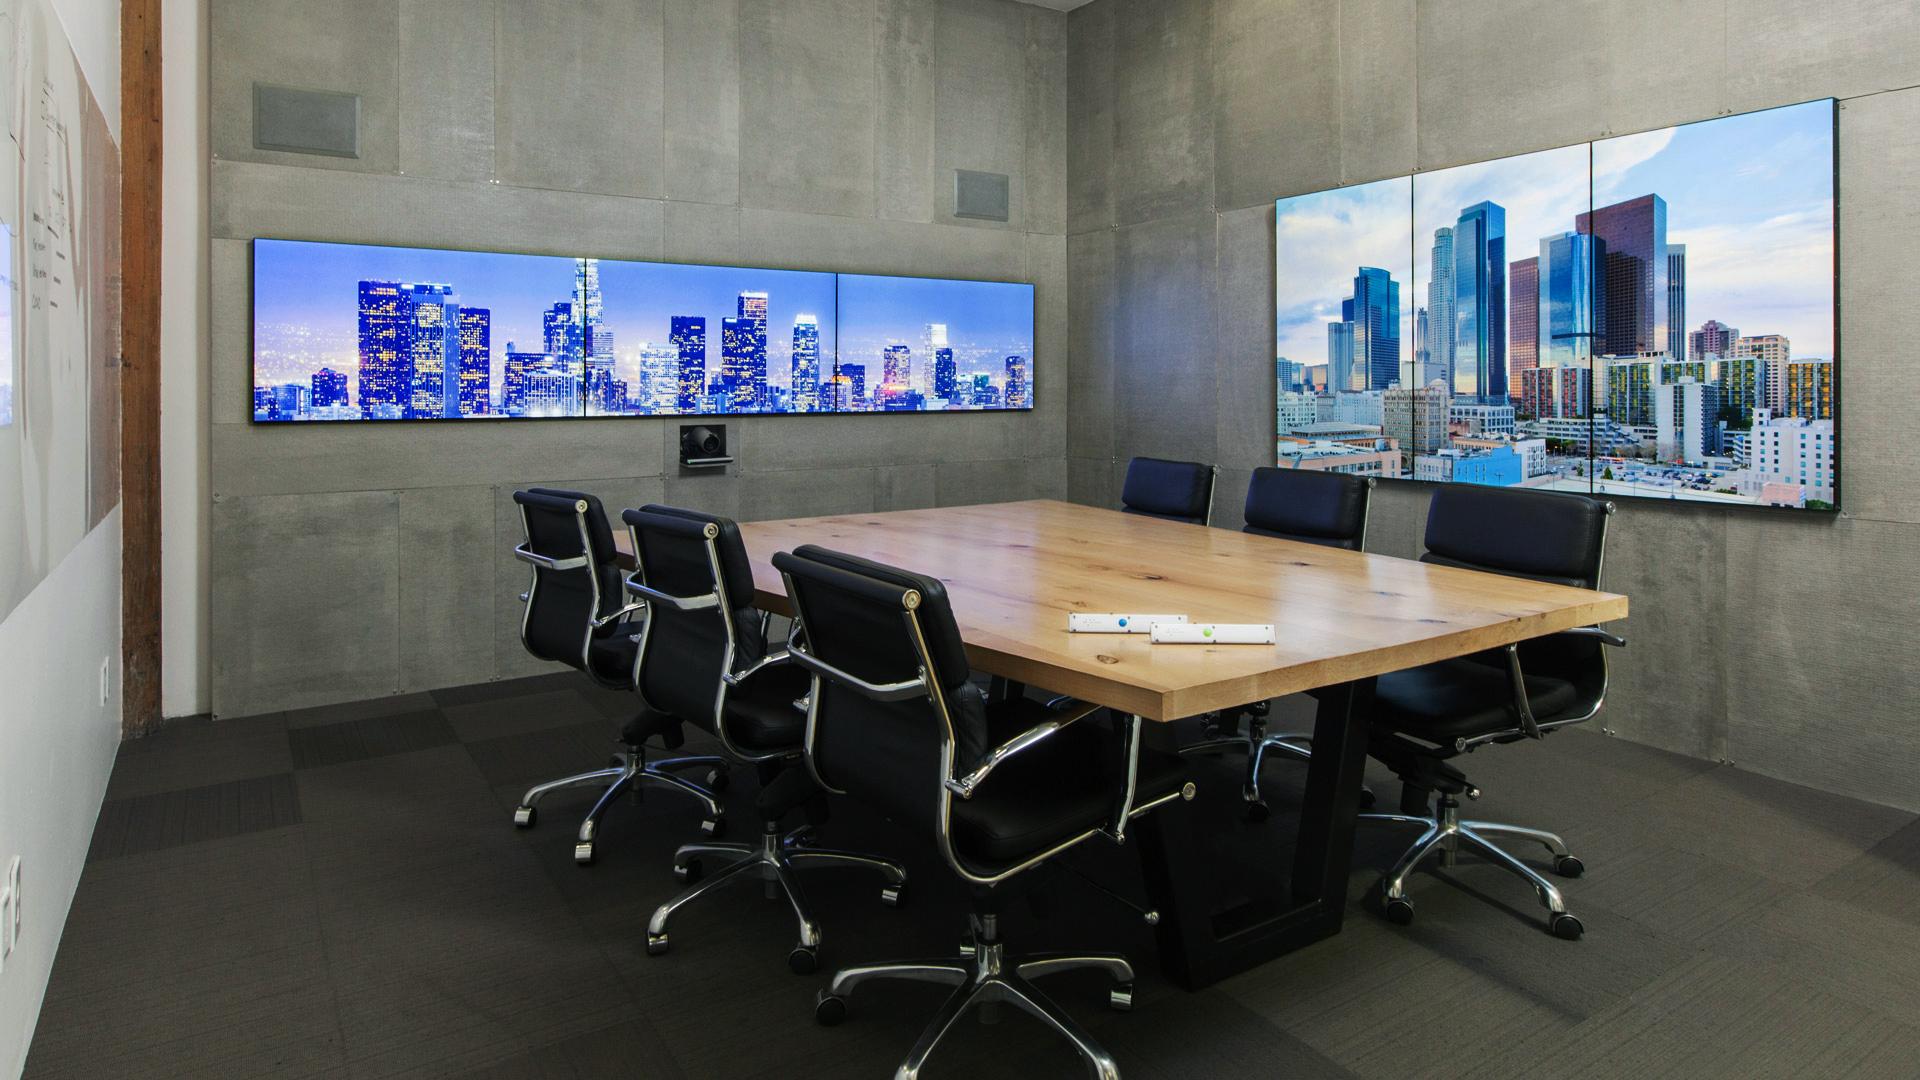 Studio HHH_Oblong Conference Room_2.jpg